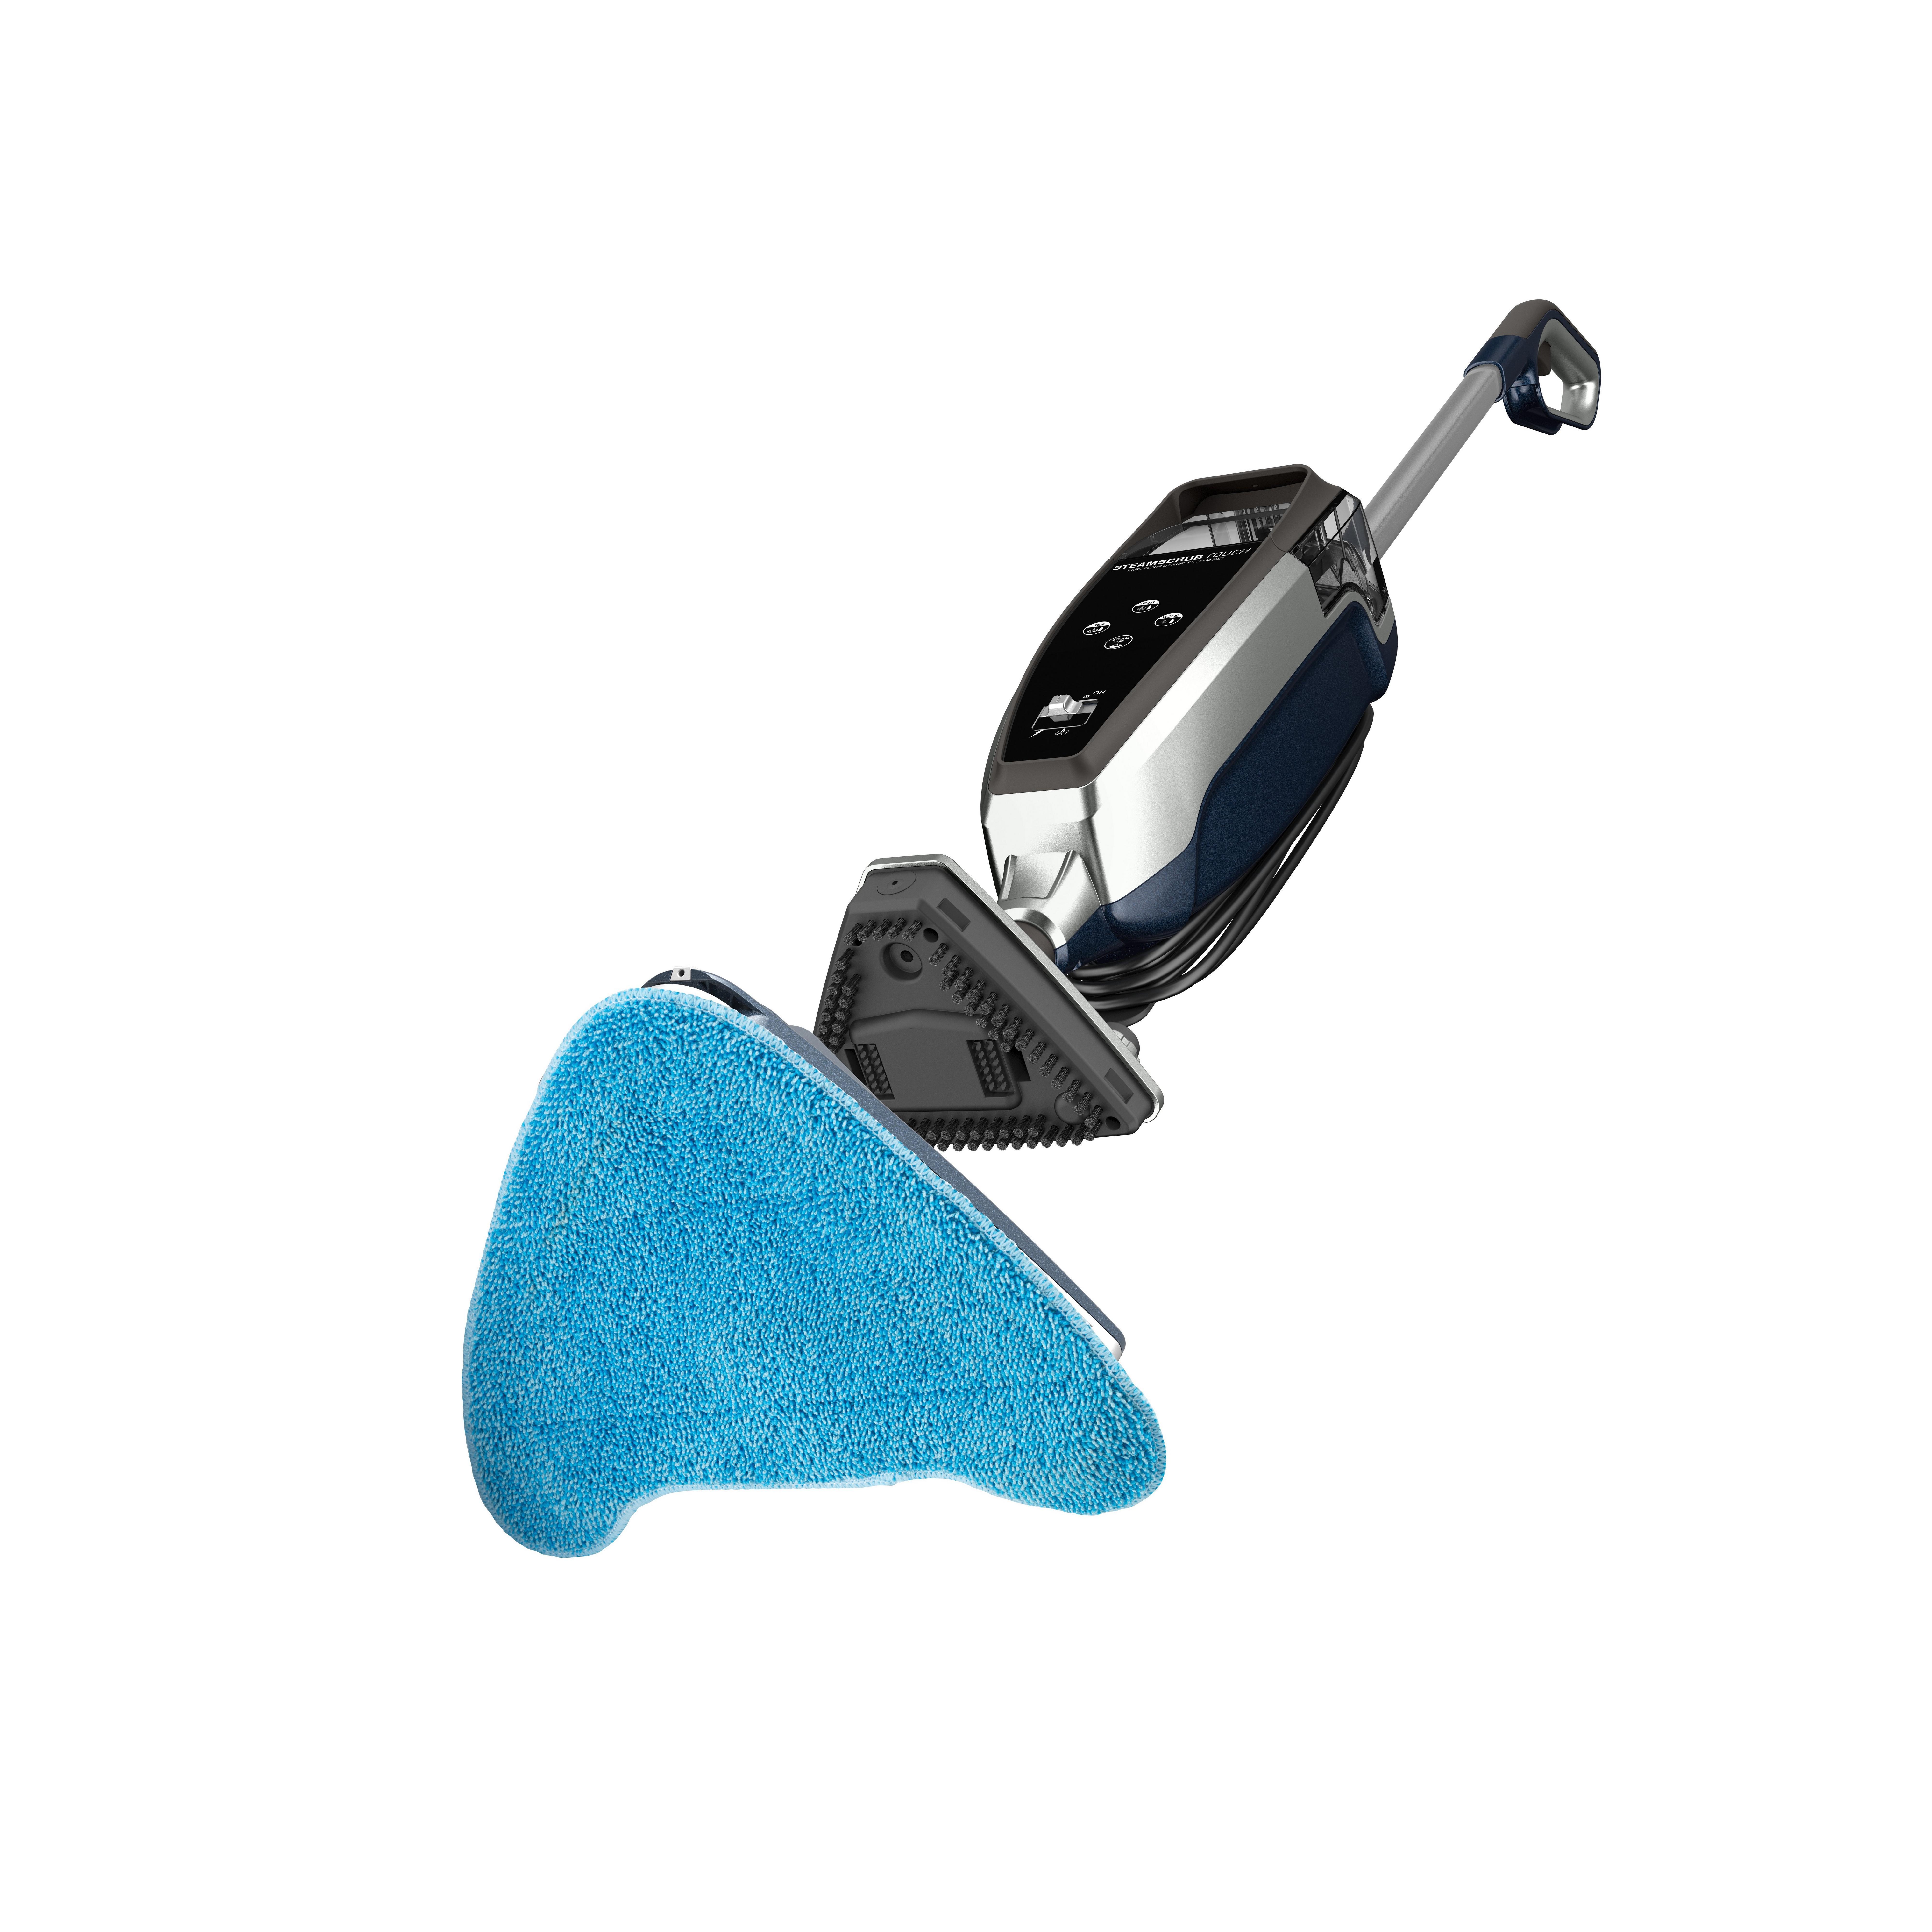 FloorMate SteamScrub Touch Steam Cleaner Mop3